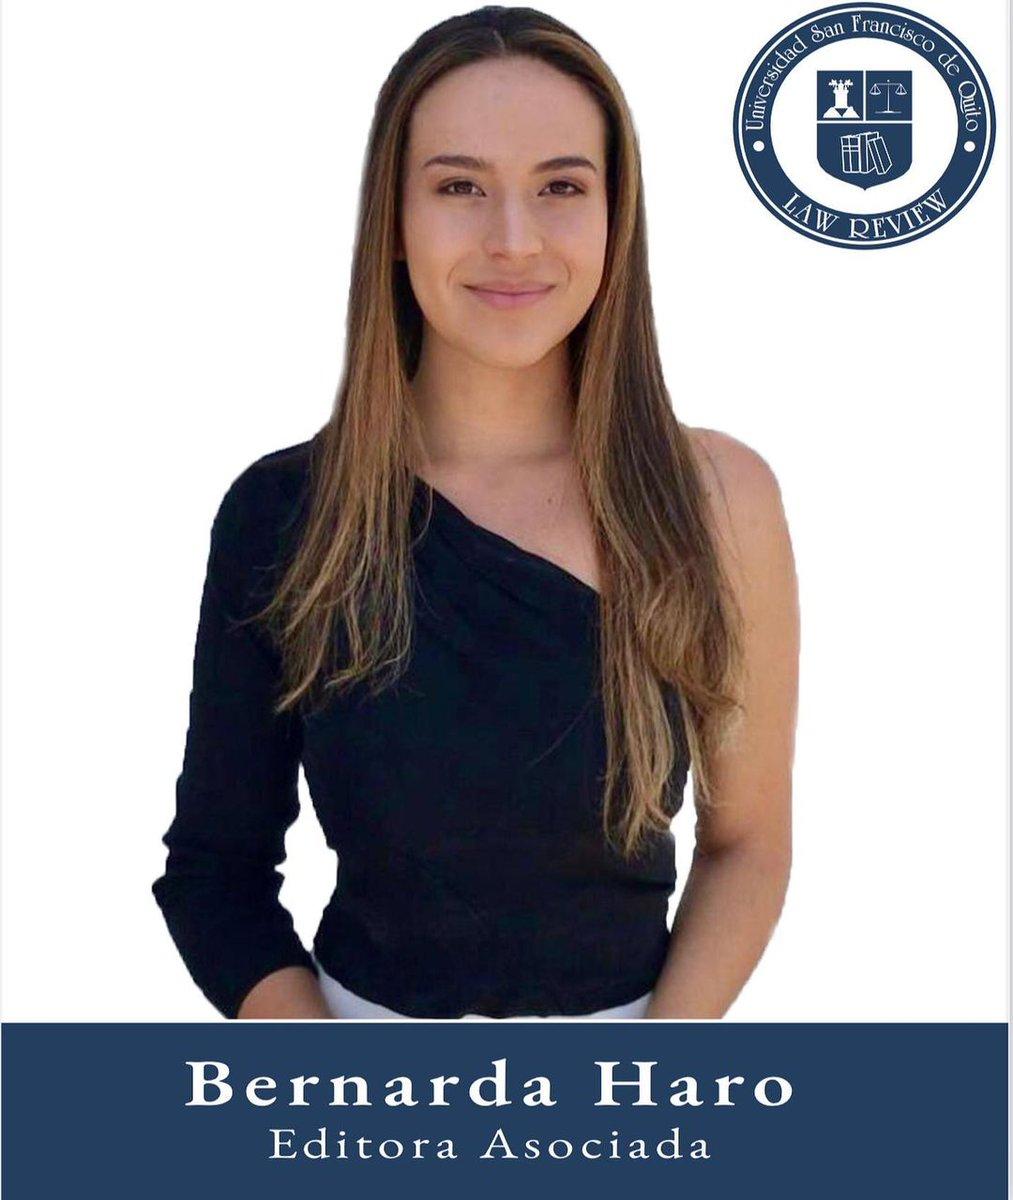 Bernarda Haro Editora Asociada Octavo semestre  Colegio de Jurisprudencia  Universidad San Francisco de Quito https://t.co/Q3wKwuKp0L